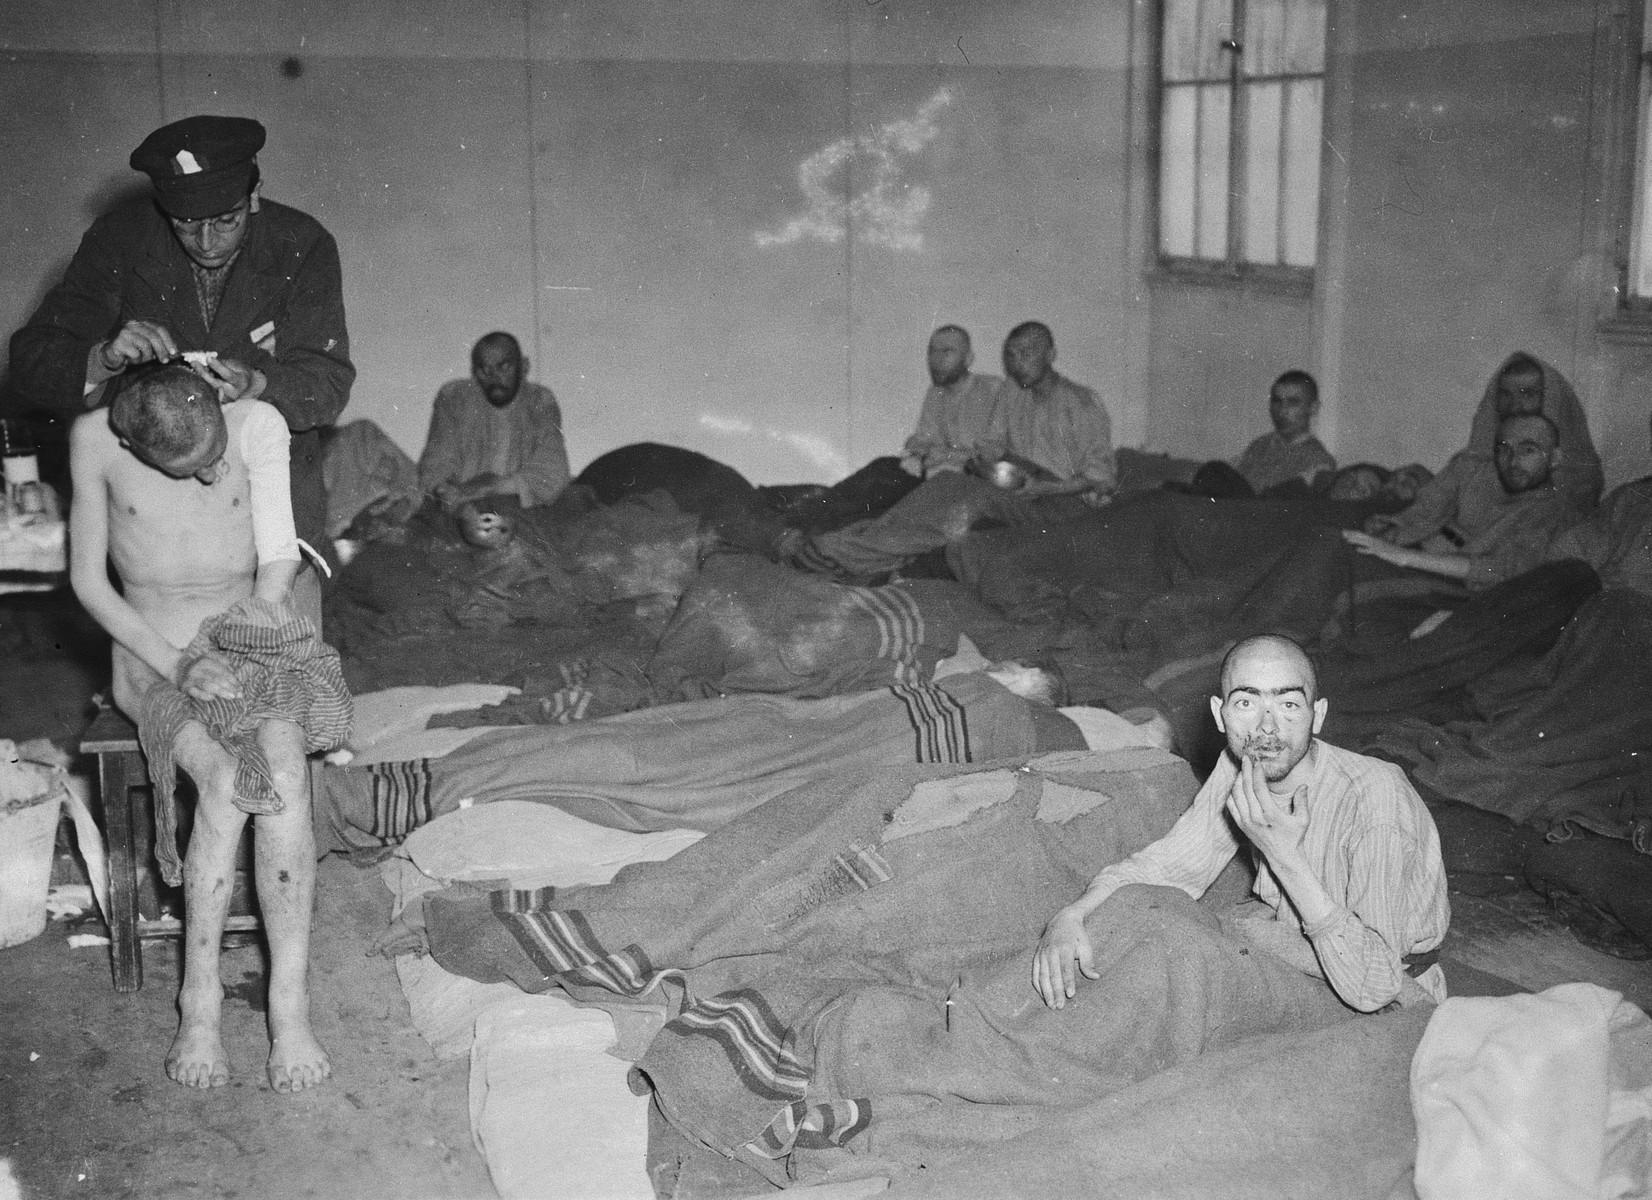 An American serviceman delouses a survivor in the Dachau concentration camp.